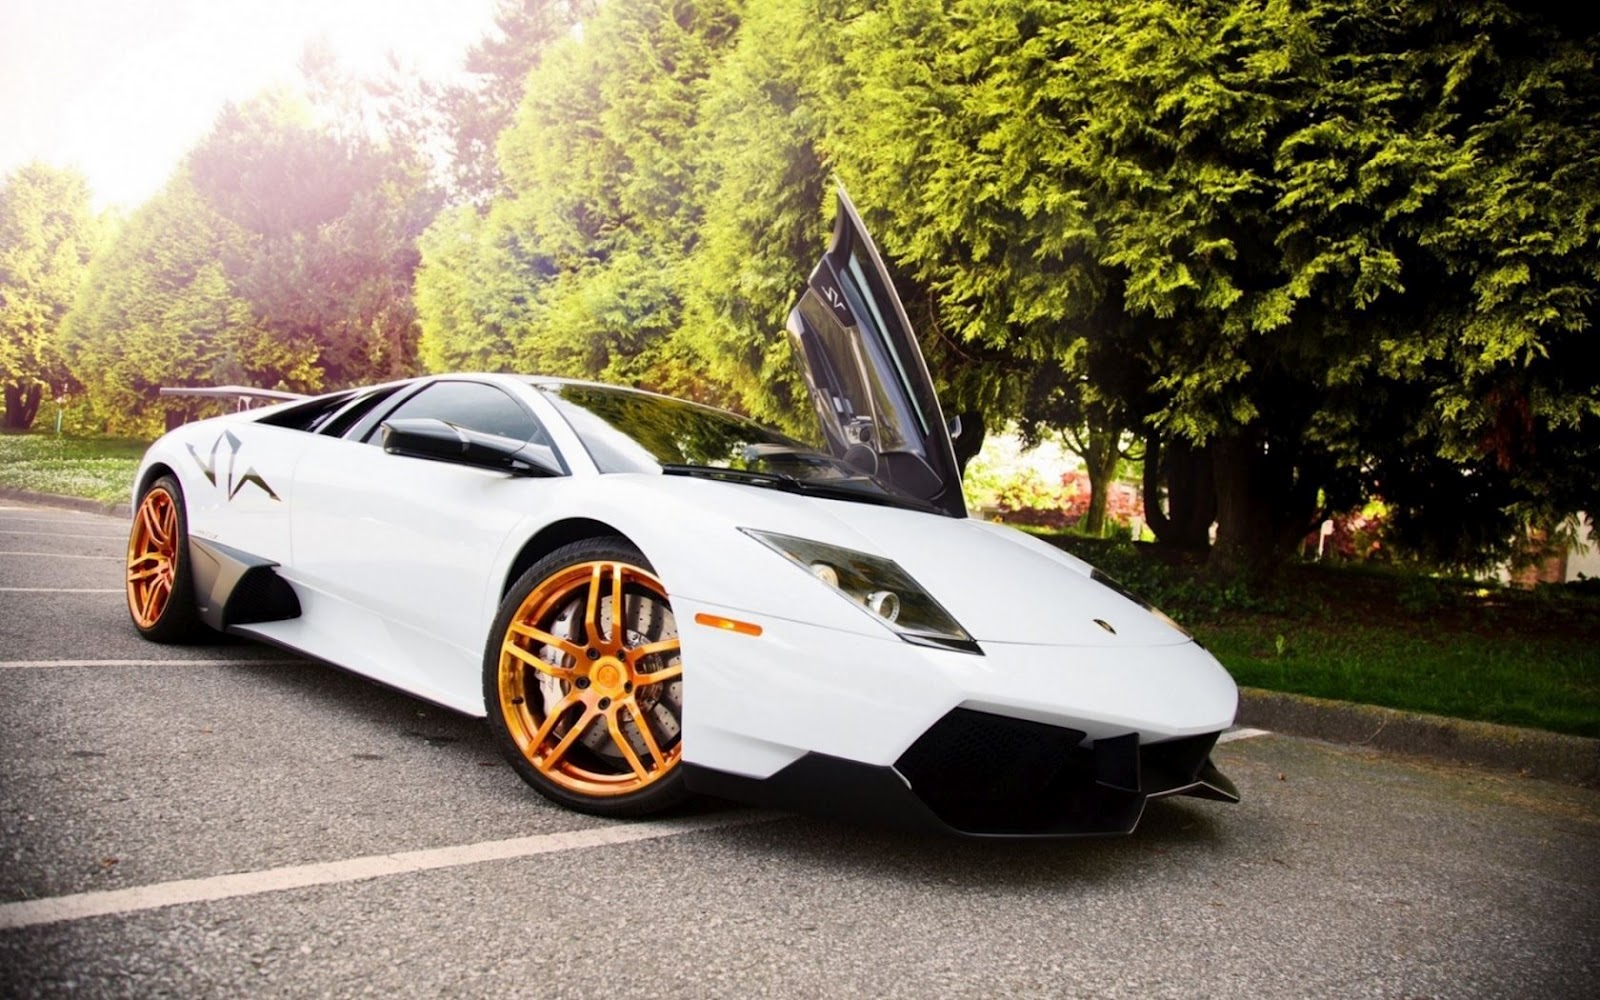 Gold And Black Lamborghini Wallpaper 4 Background